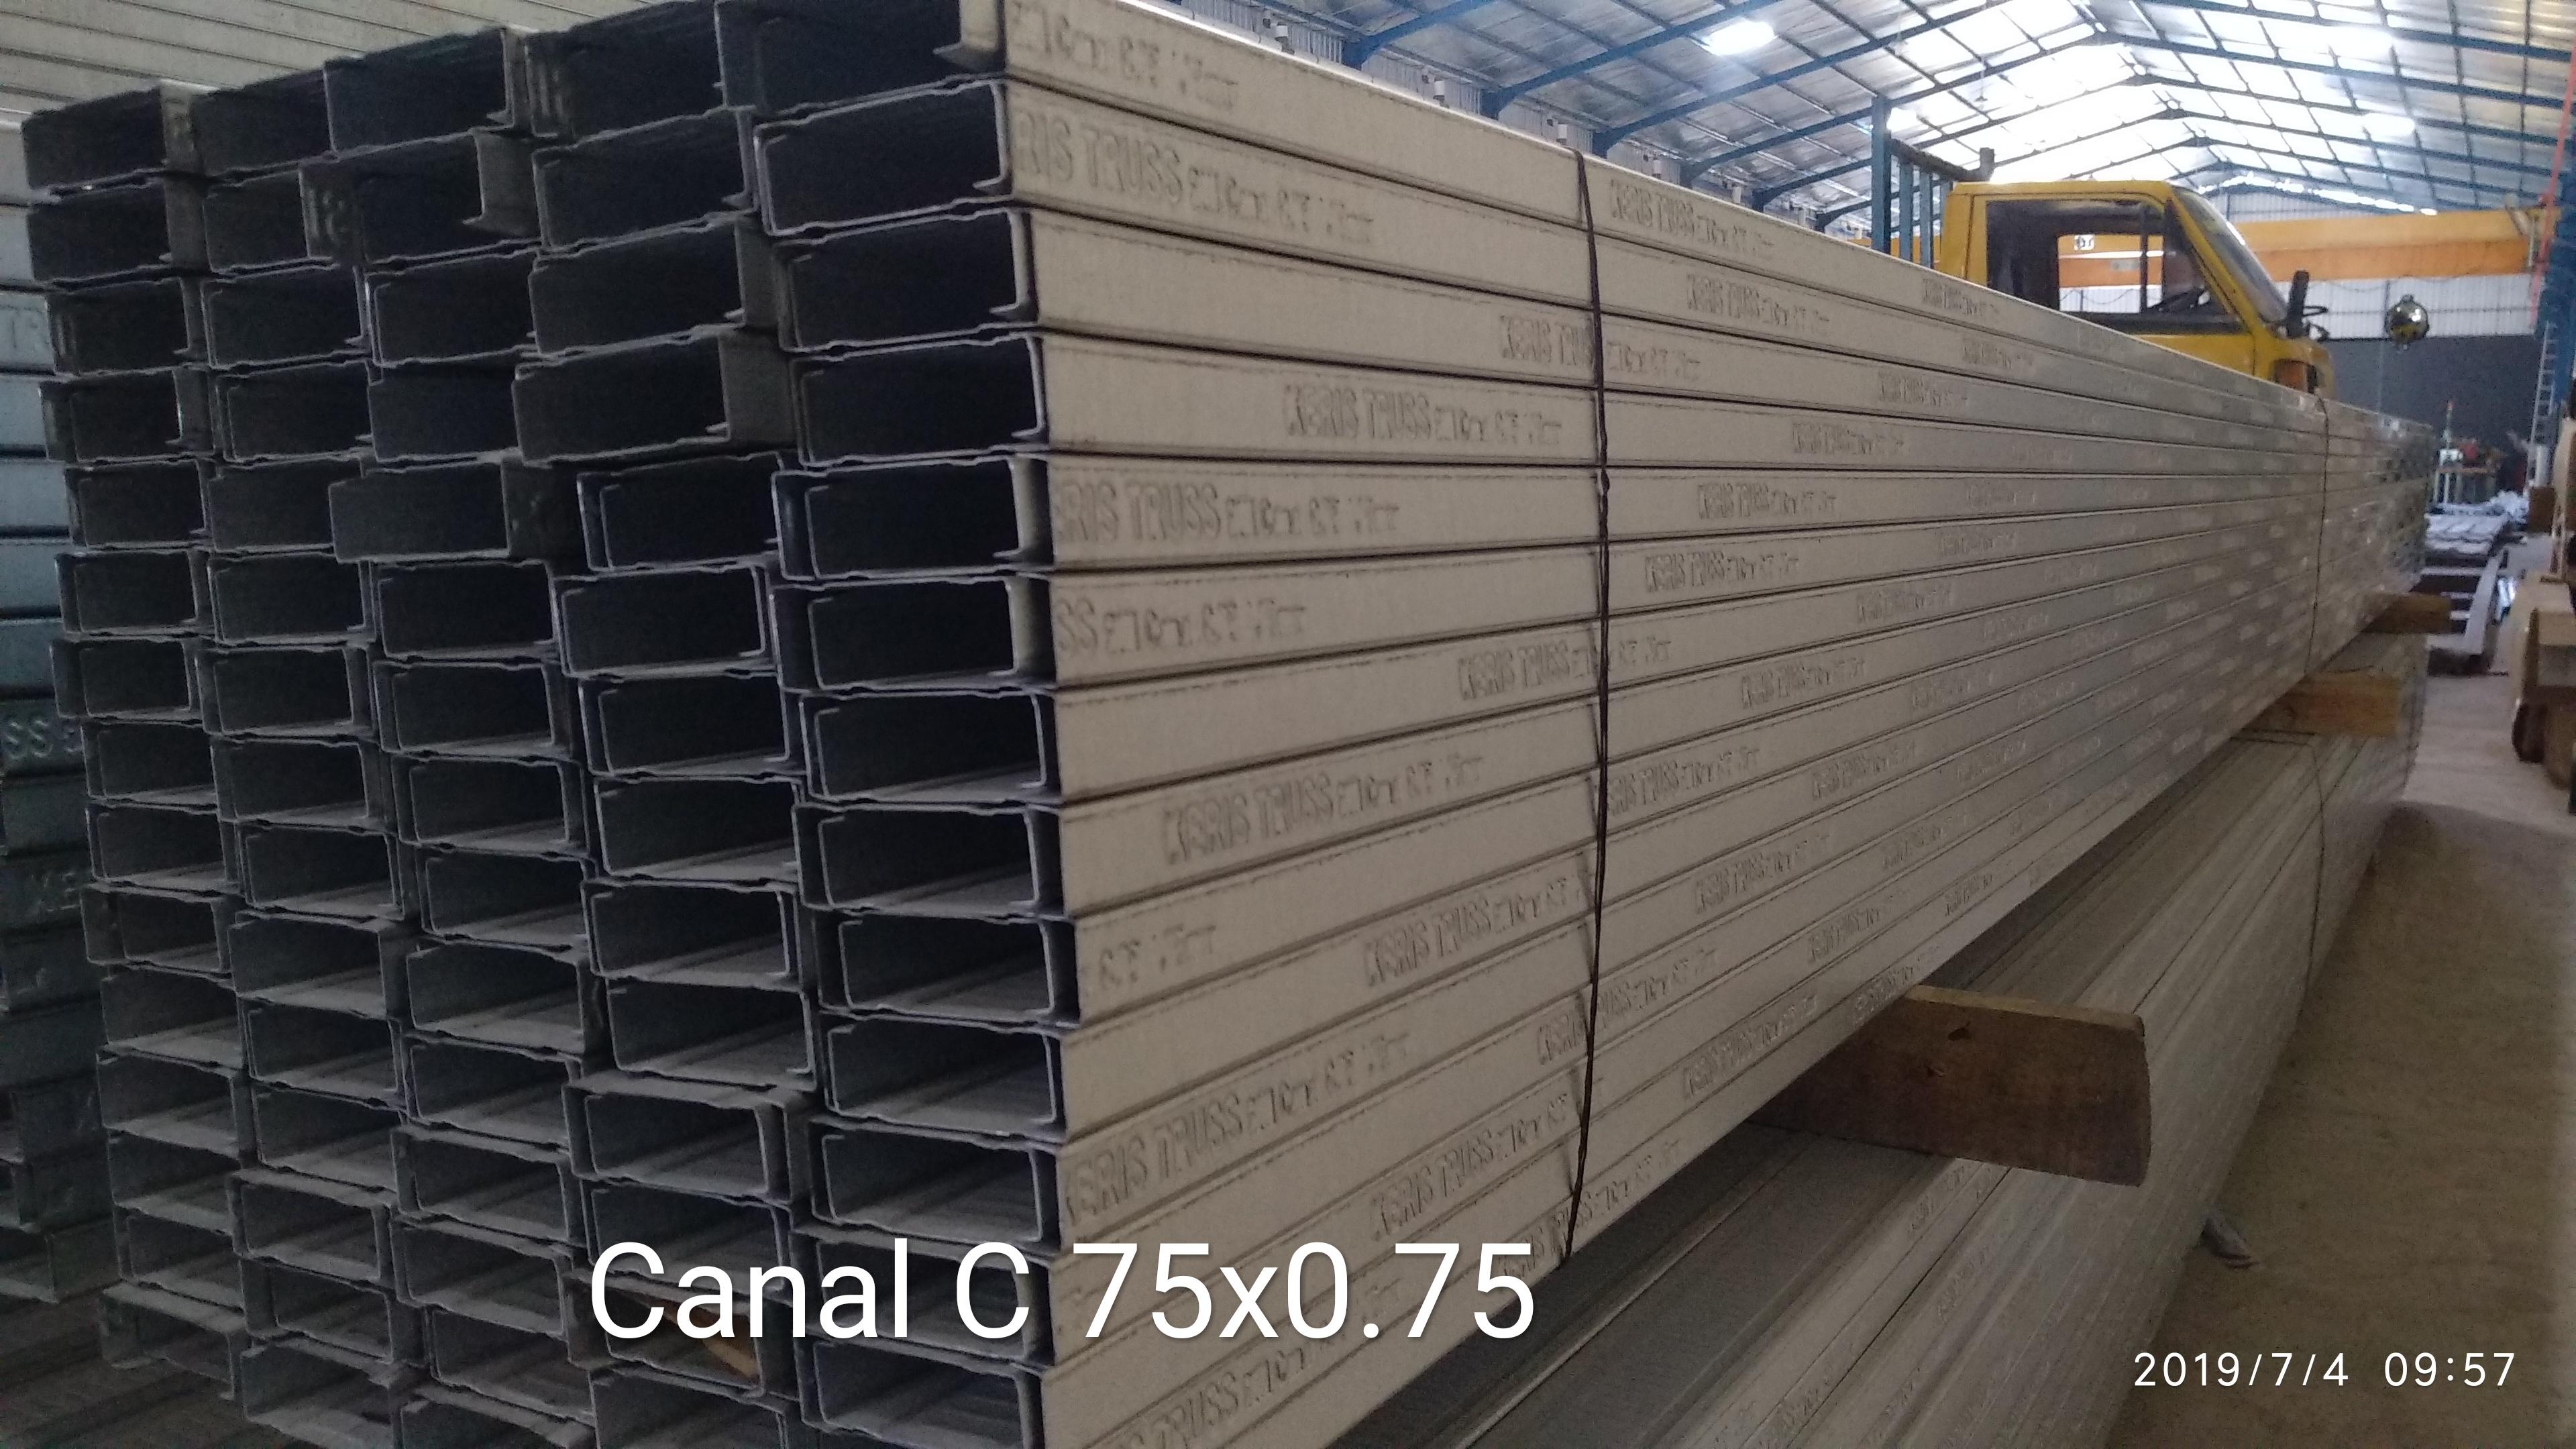 pabrik baja ringan makassar jual bajaringan canal c gudang